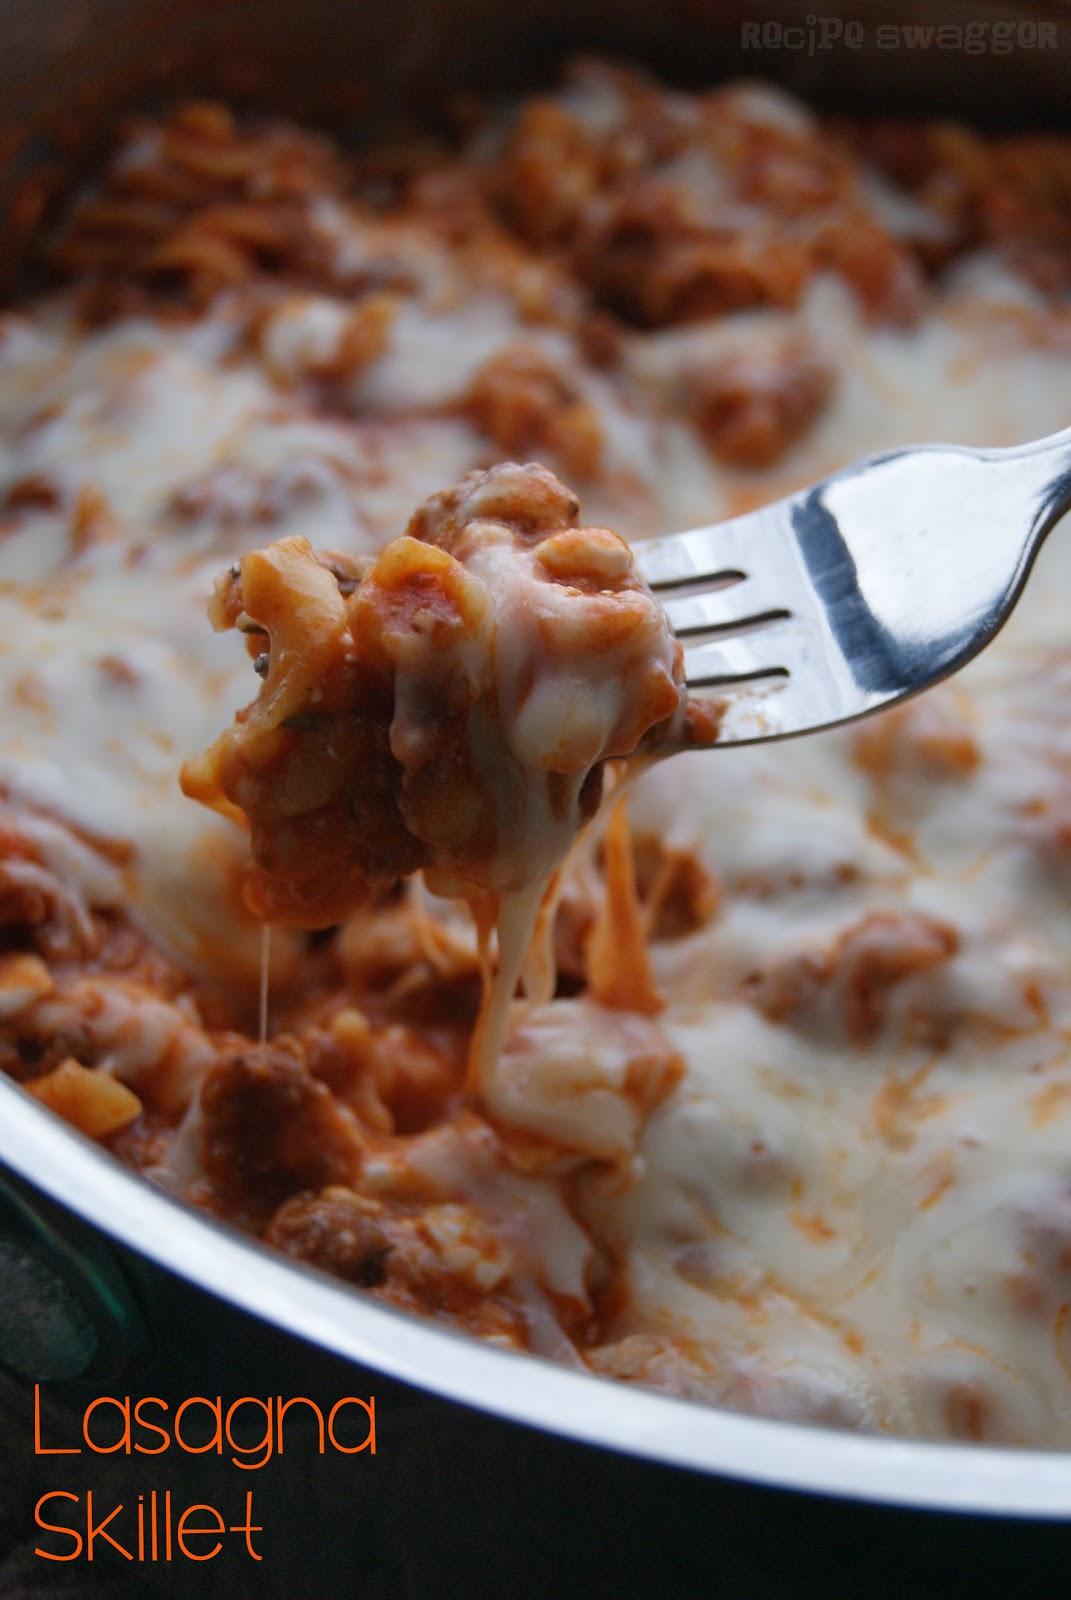 Lasagna Skillet